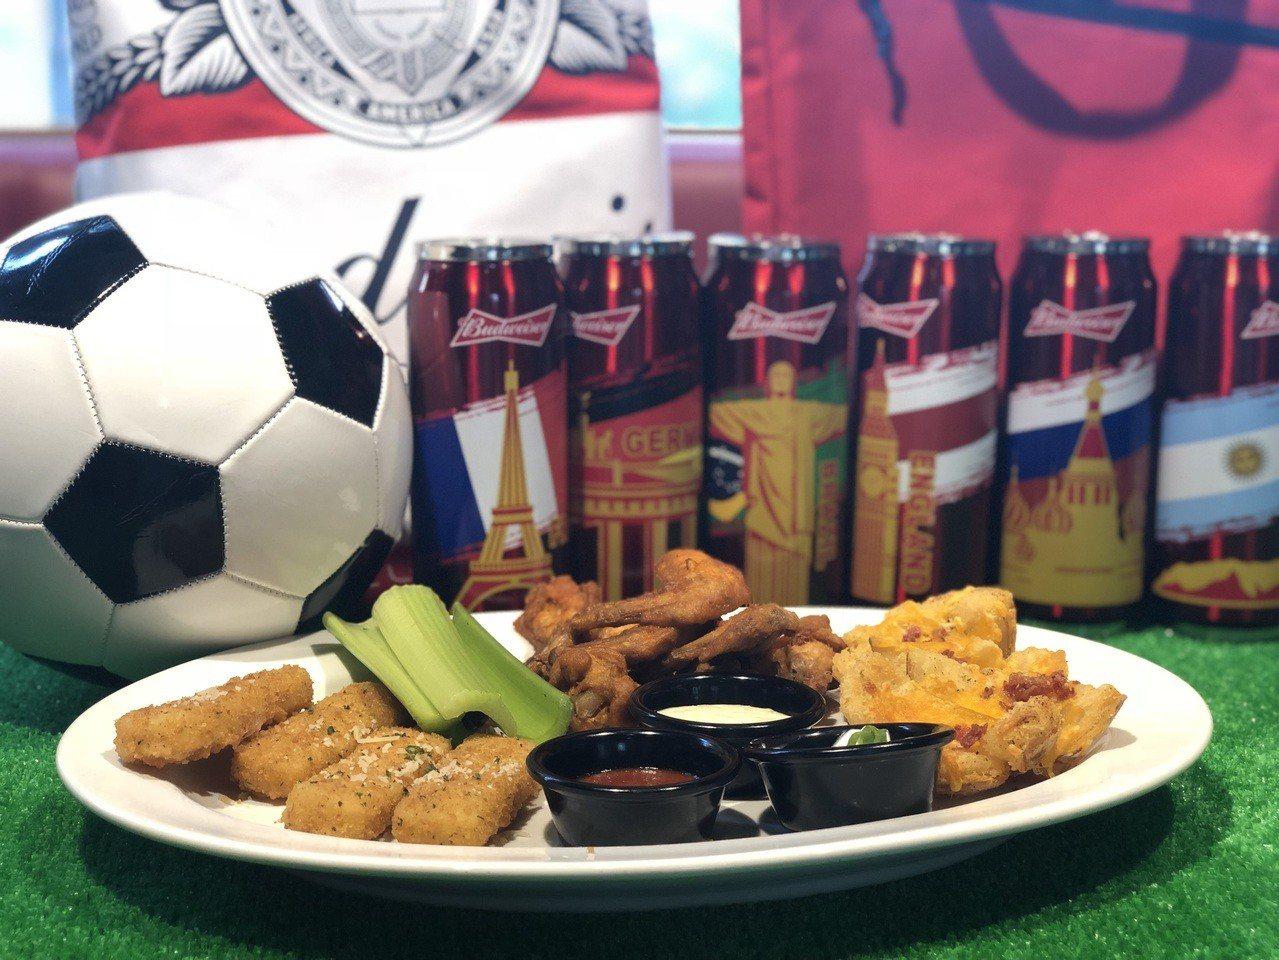 TGI FRIDAYS推出限定餐點及轉播賽事,若是點分享餐再送百威國家世界杯。記...